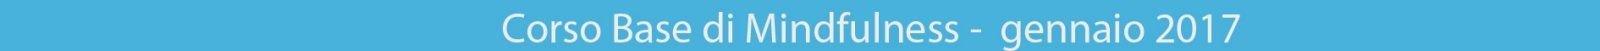 mindfulness milano - enrico gamba